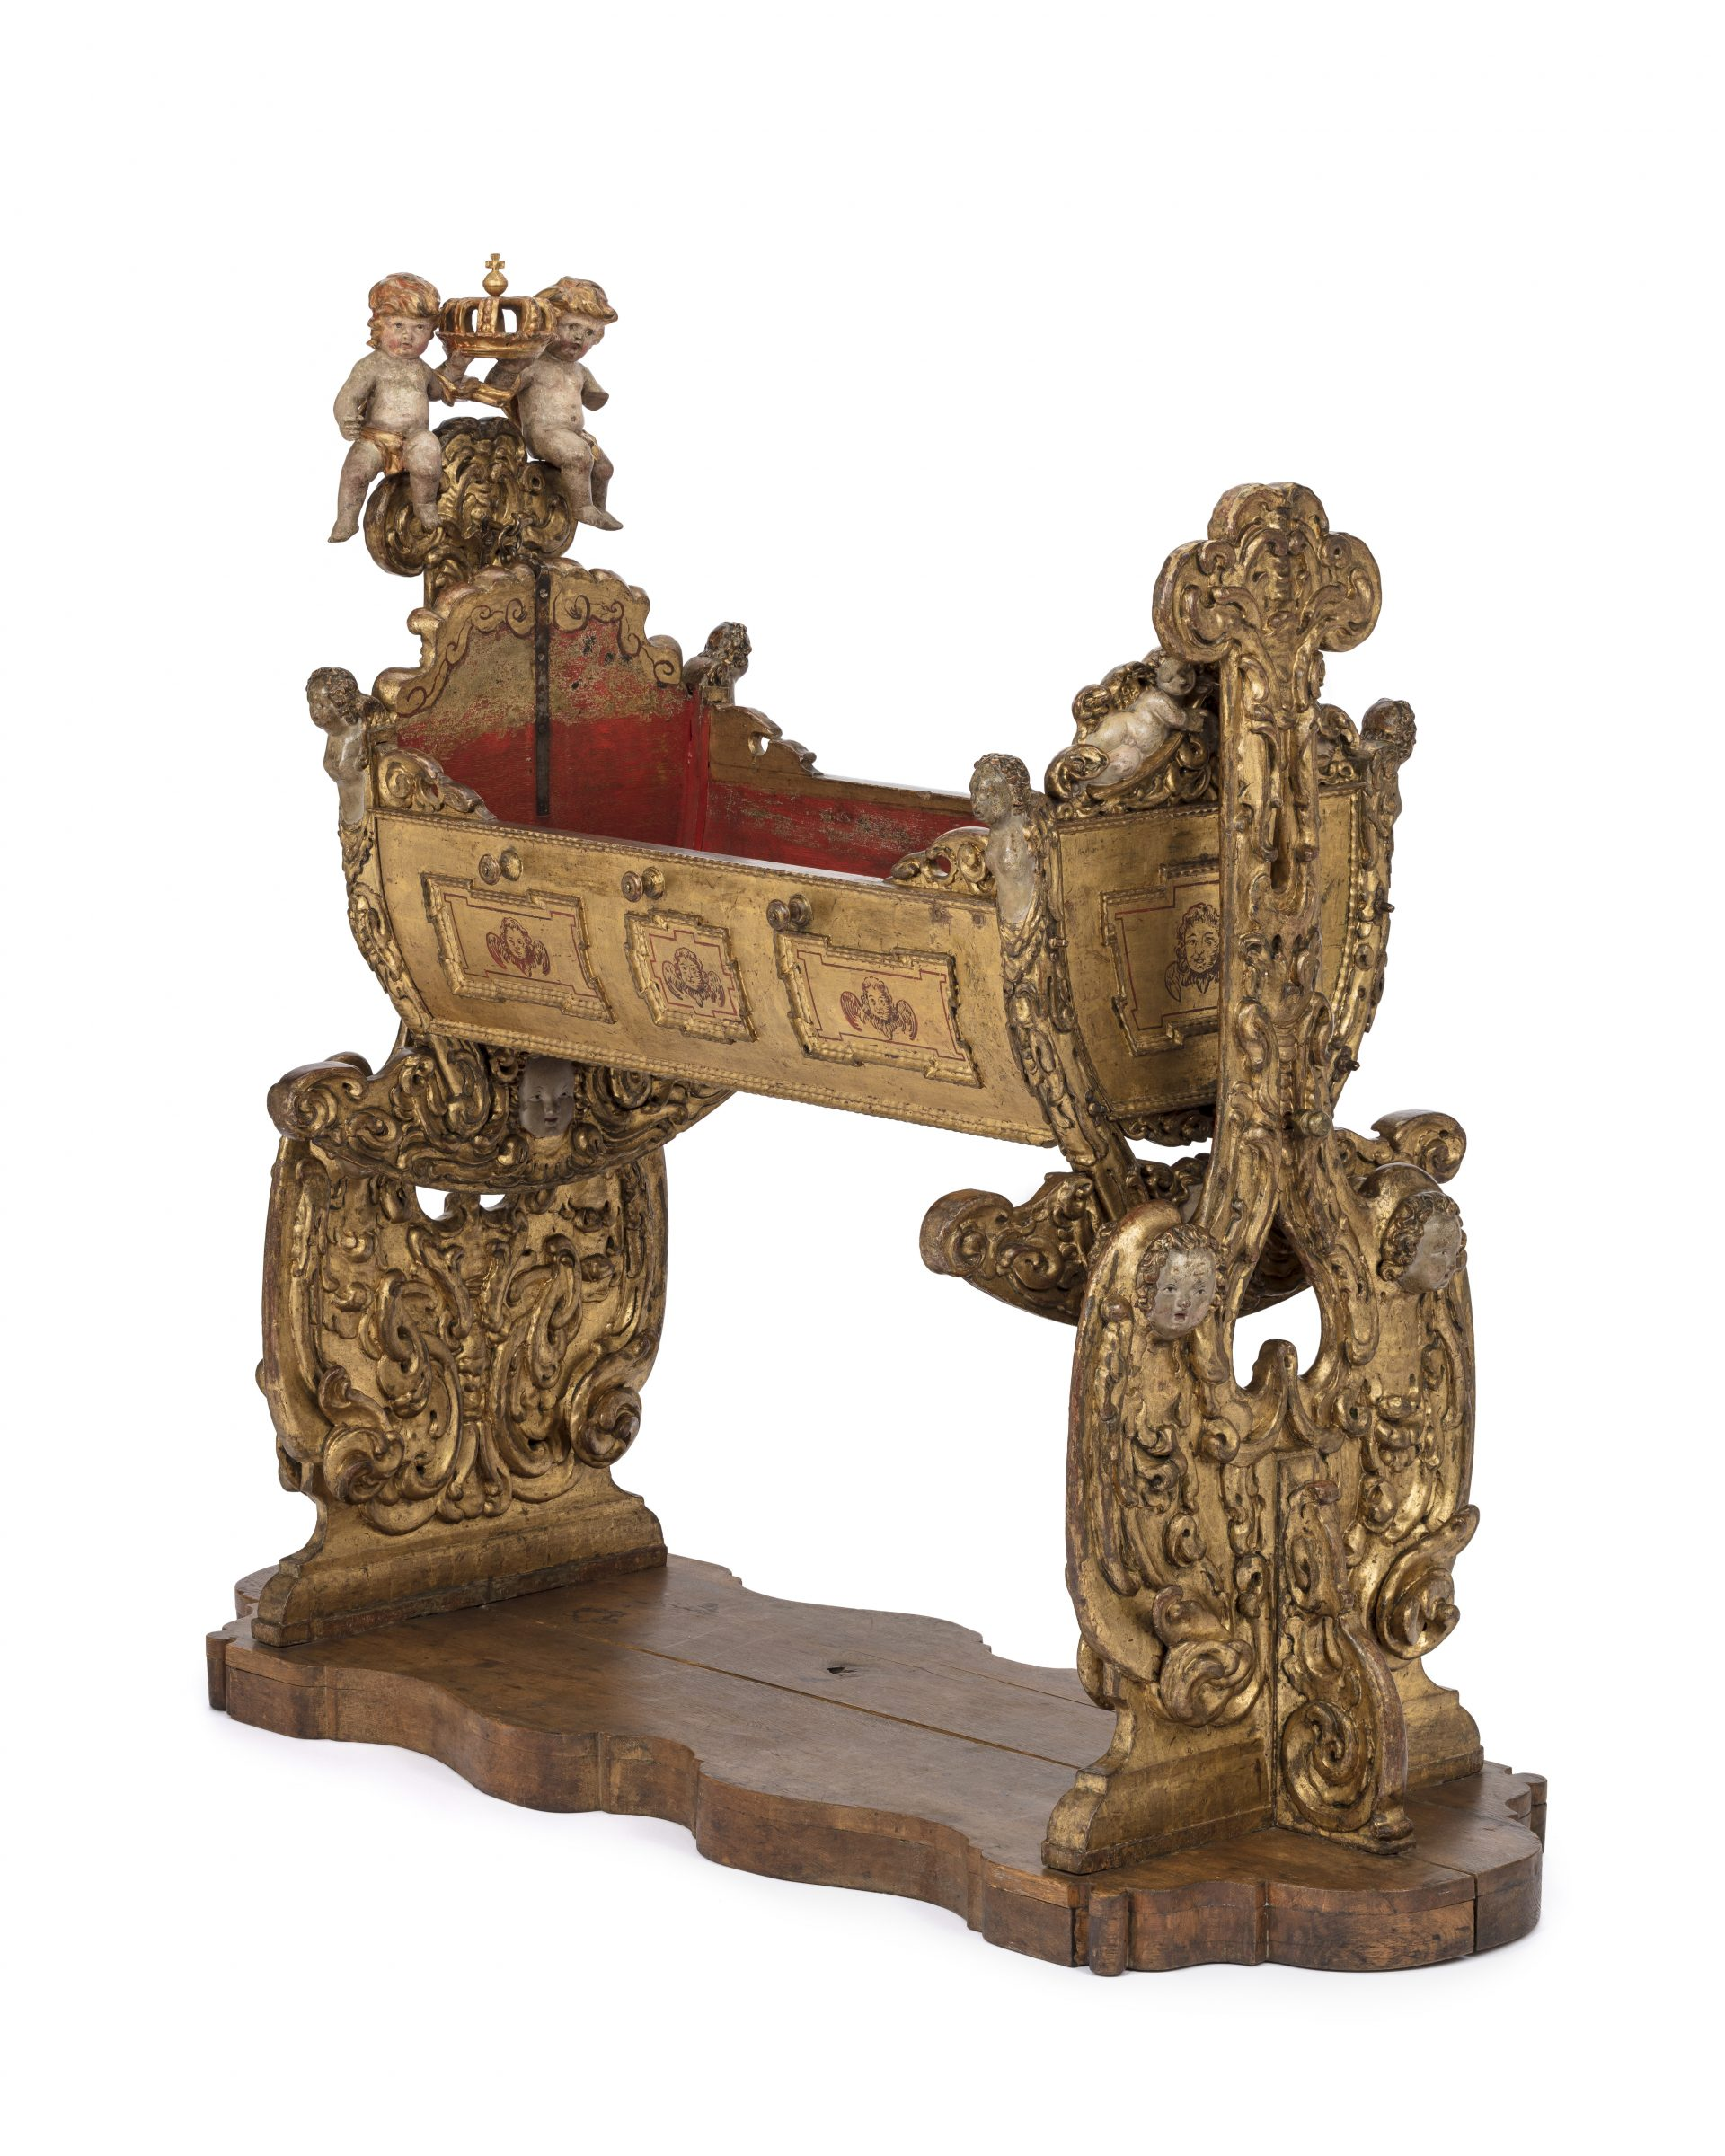 A golden cradle.